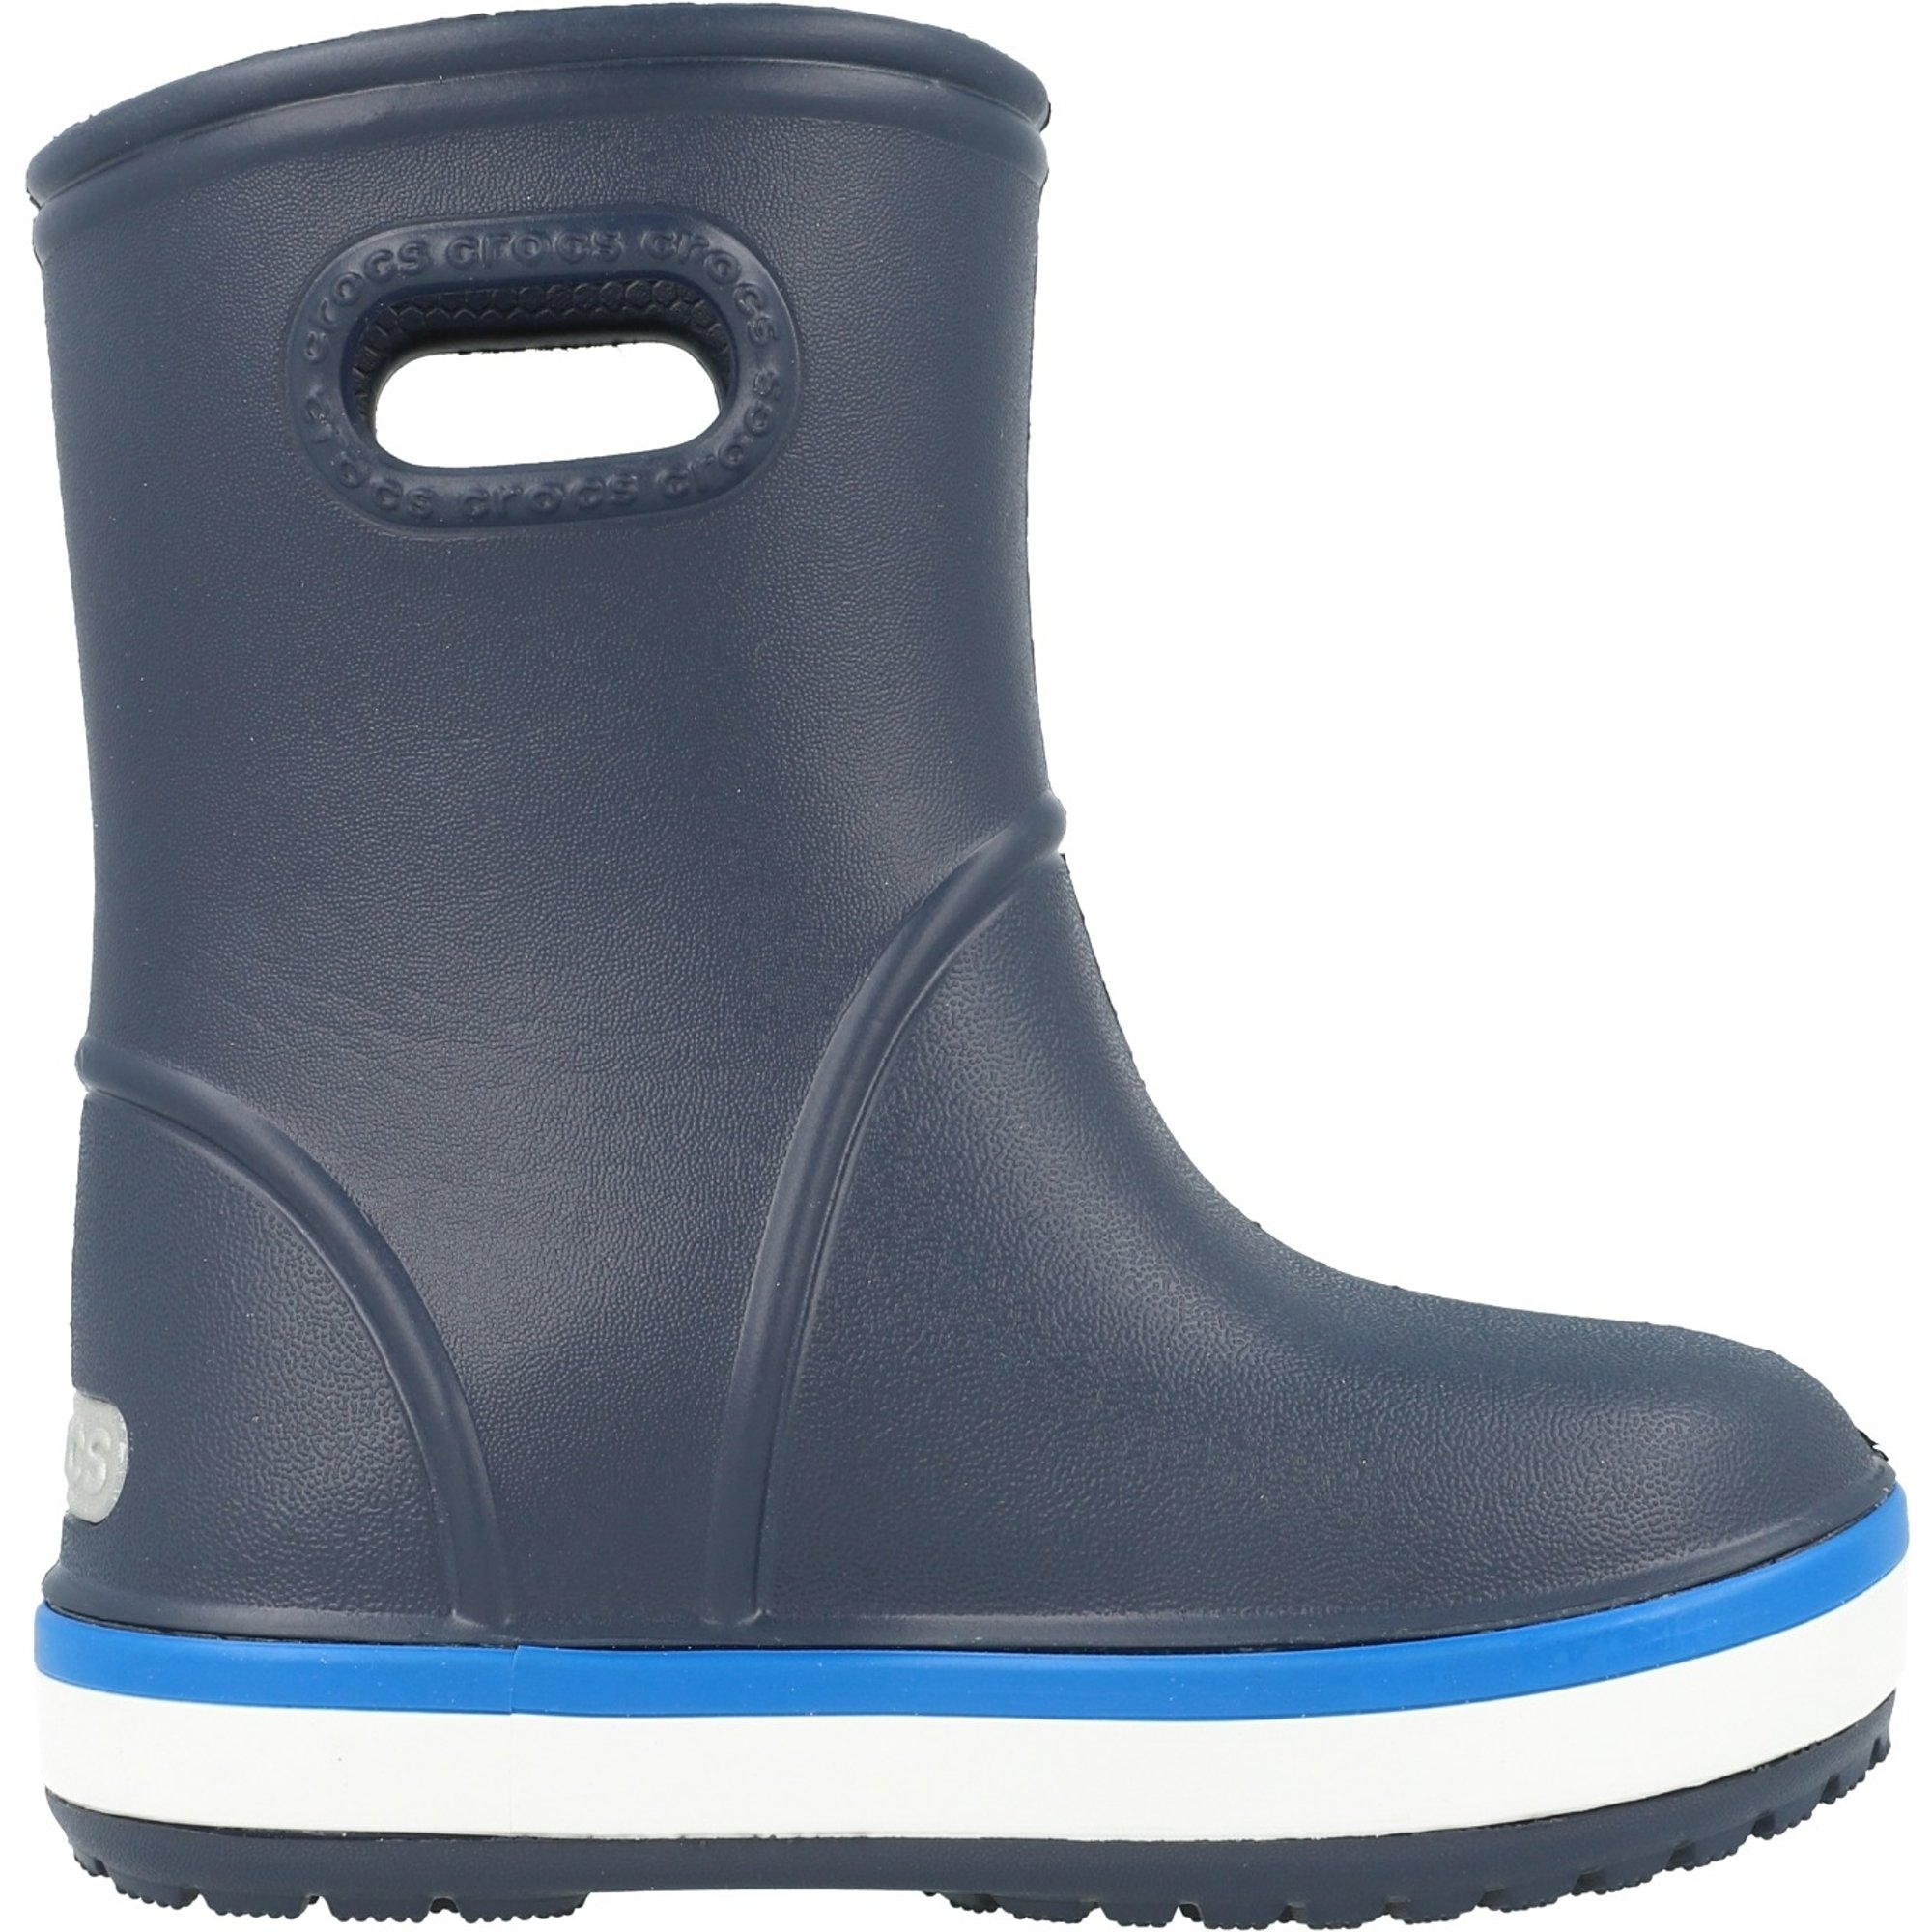 Crocs Kids Crocband Rain Boot Navy/Bright Cobalt Croslite